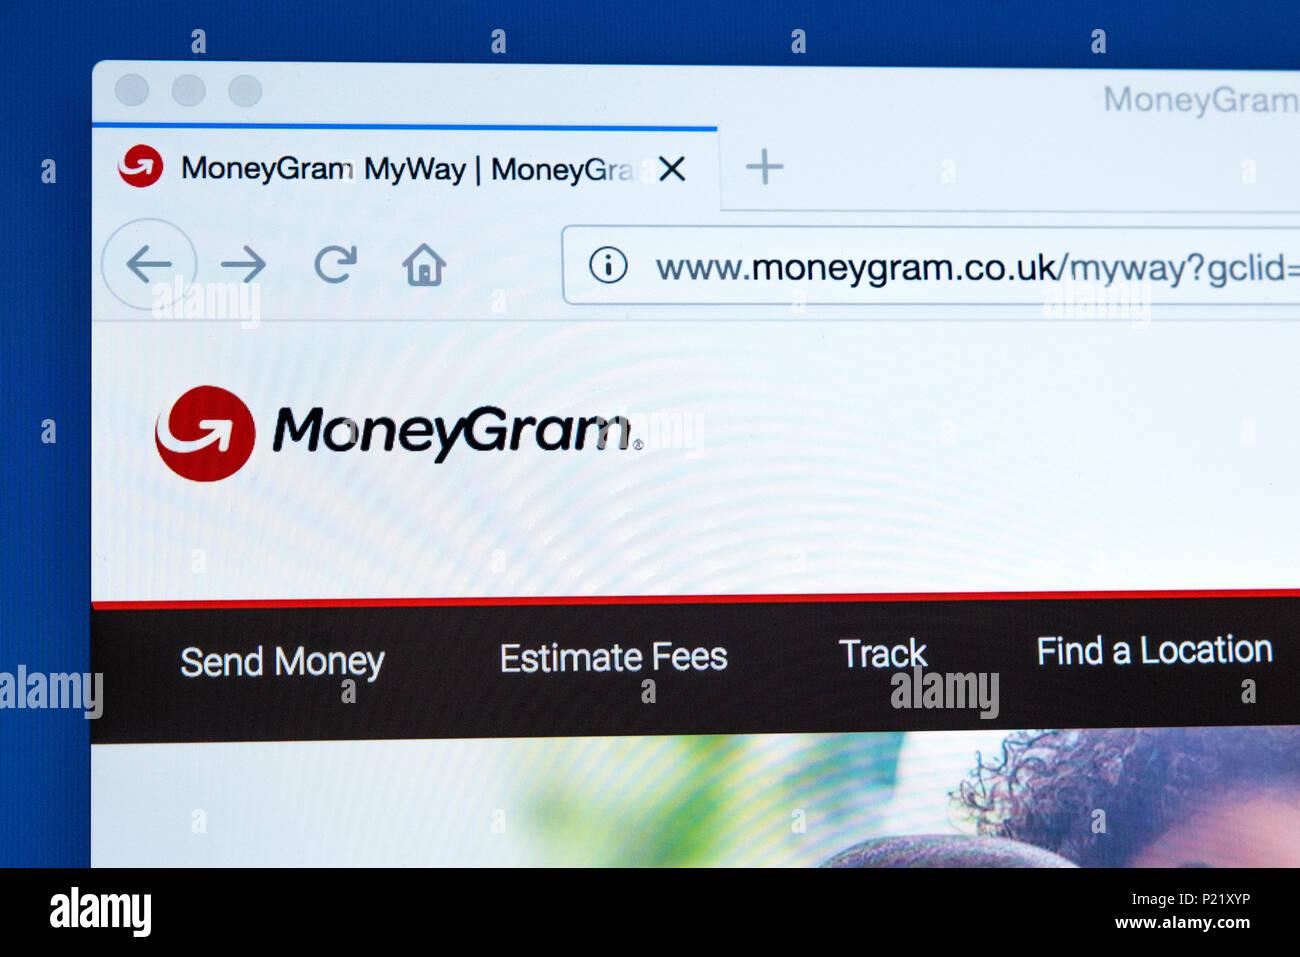 Moneygram Logo Stock Photos & Moneygram Logo Stock Images